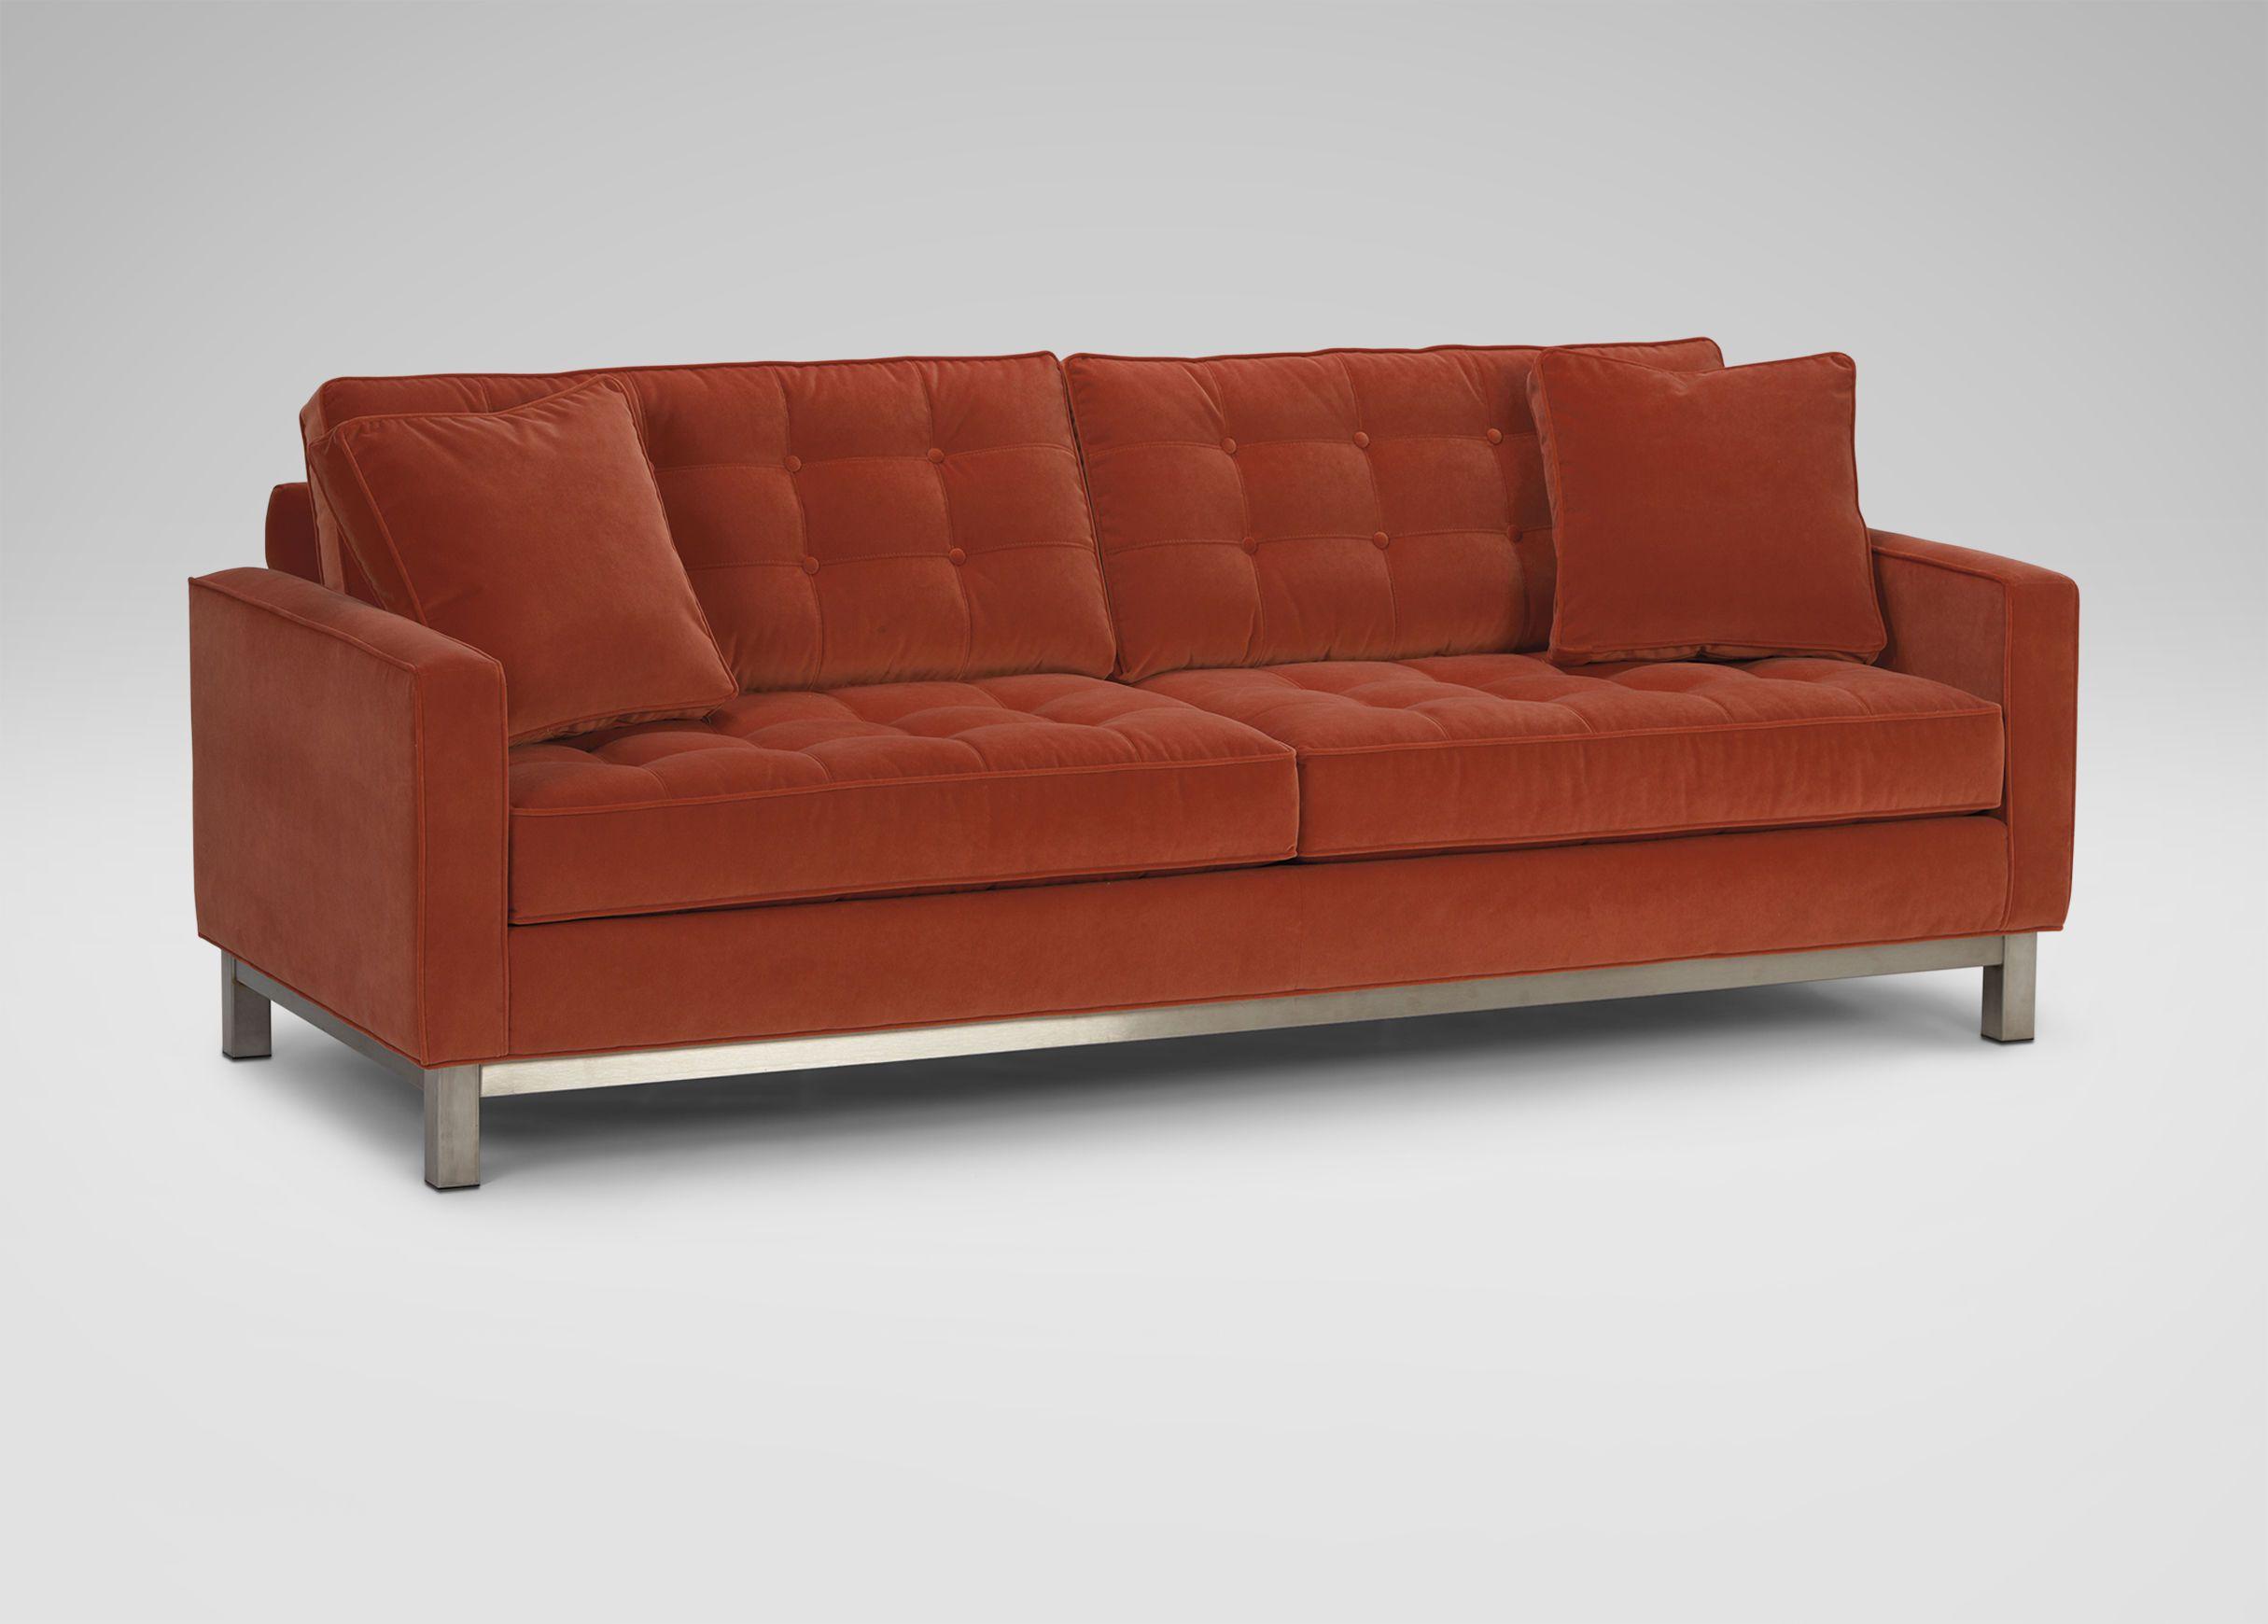 Pleasant Melrose Sofa Living Room Furniture Sofa Love Seat Pabps2019 Chair Design Images Pabps2019Com